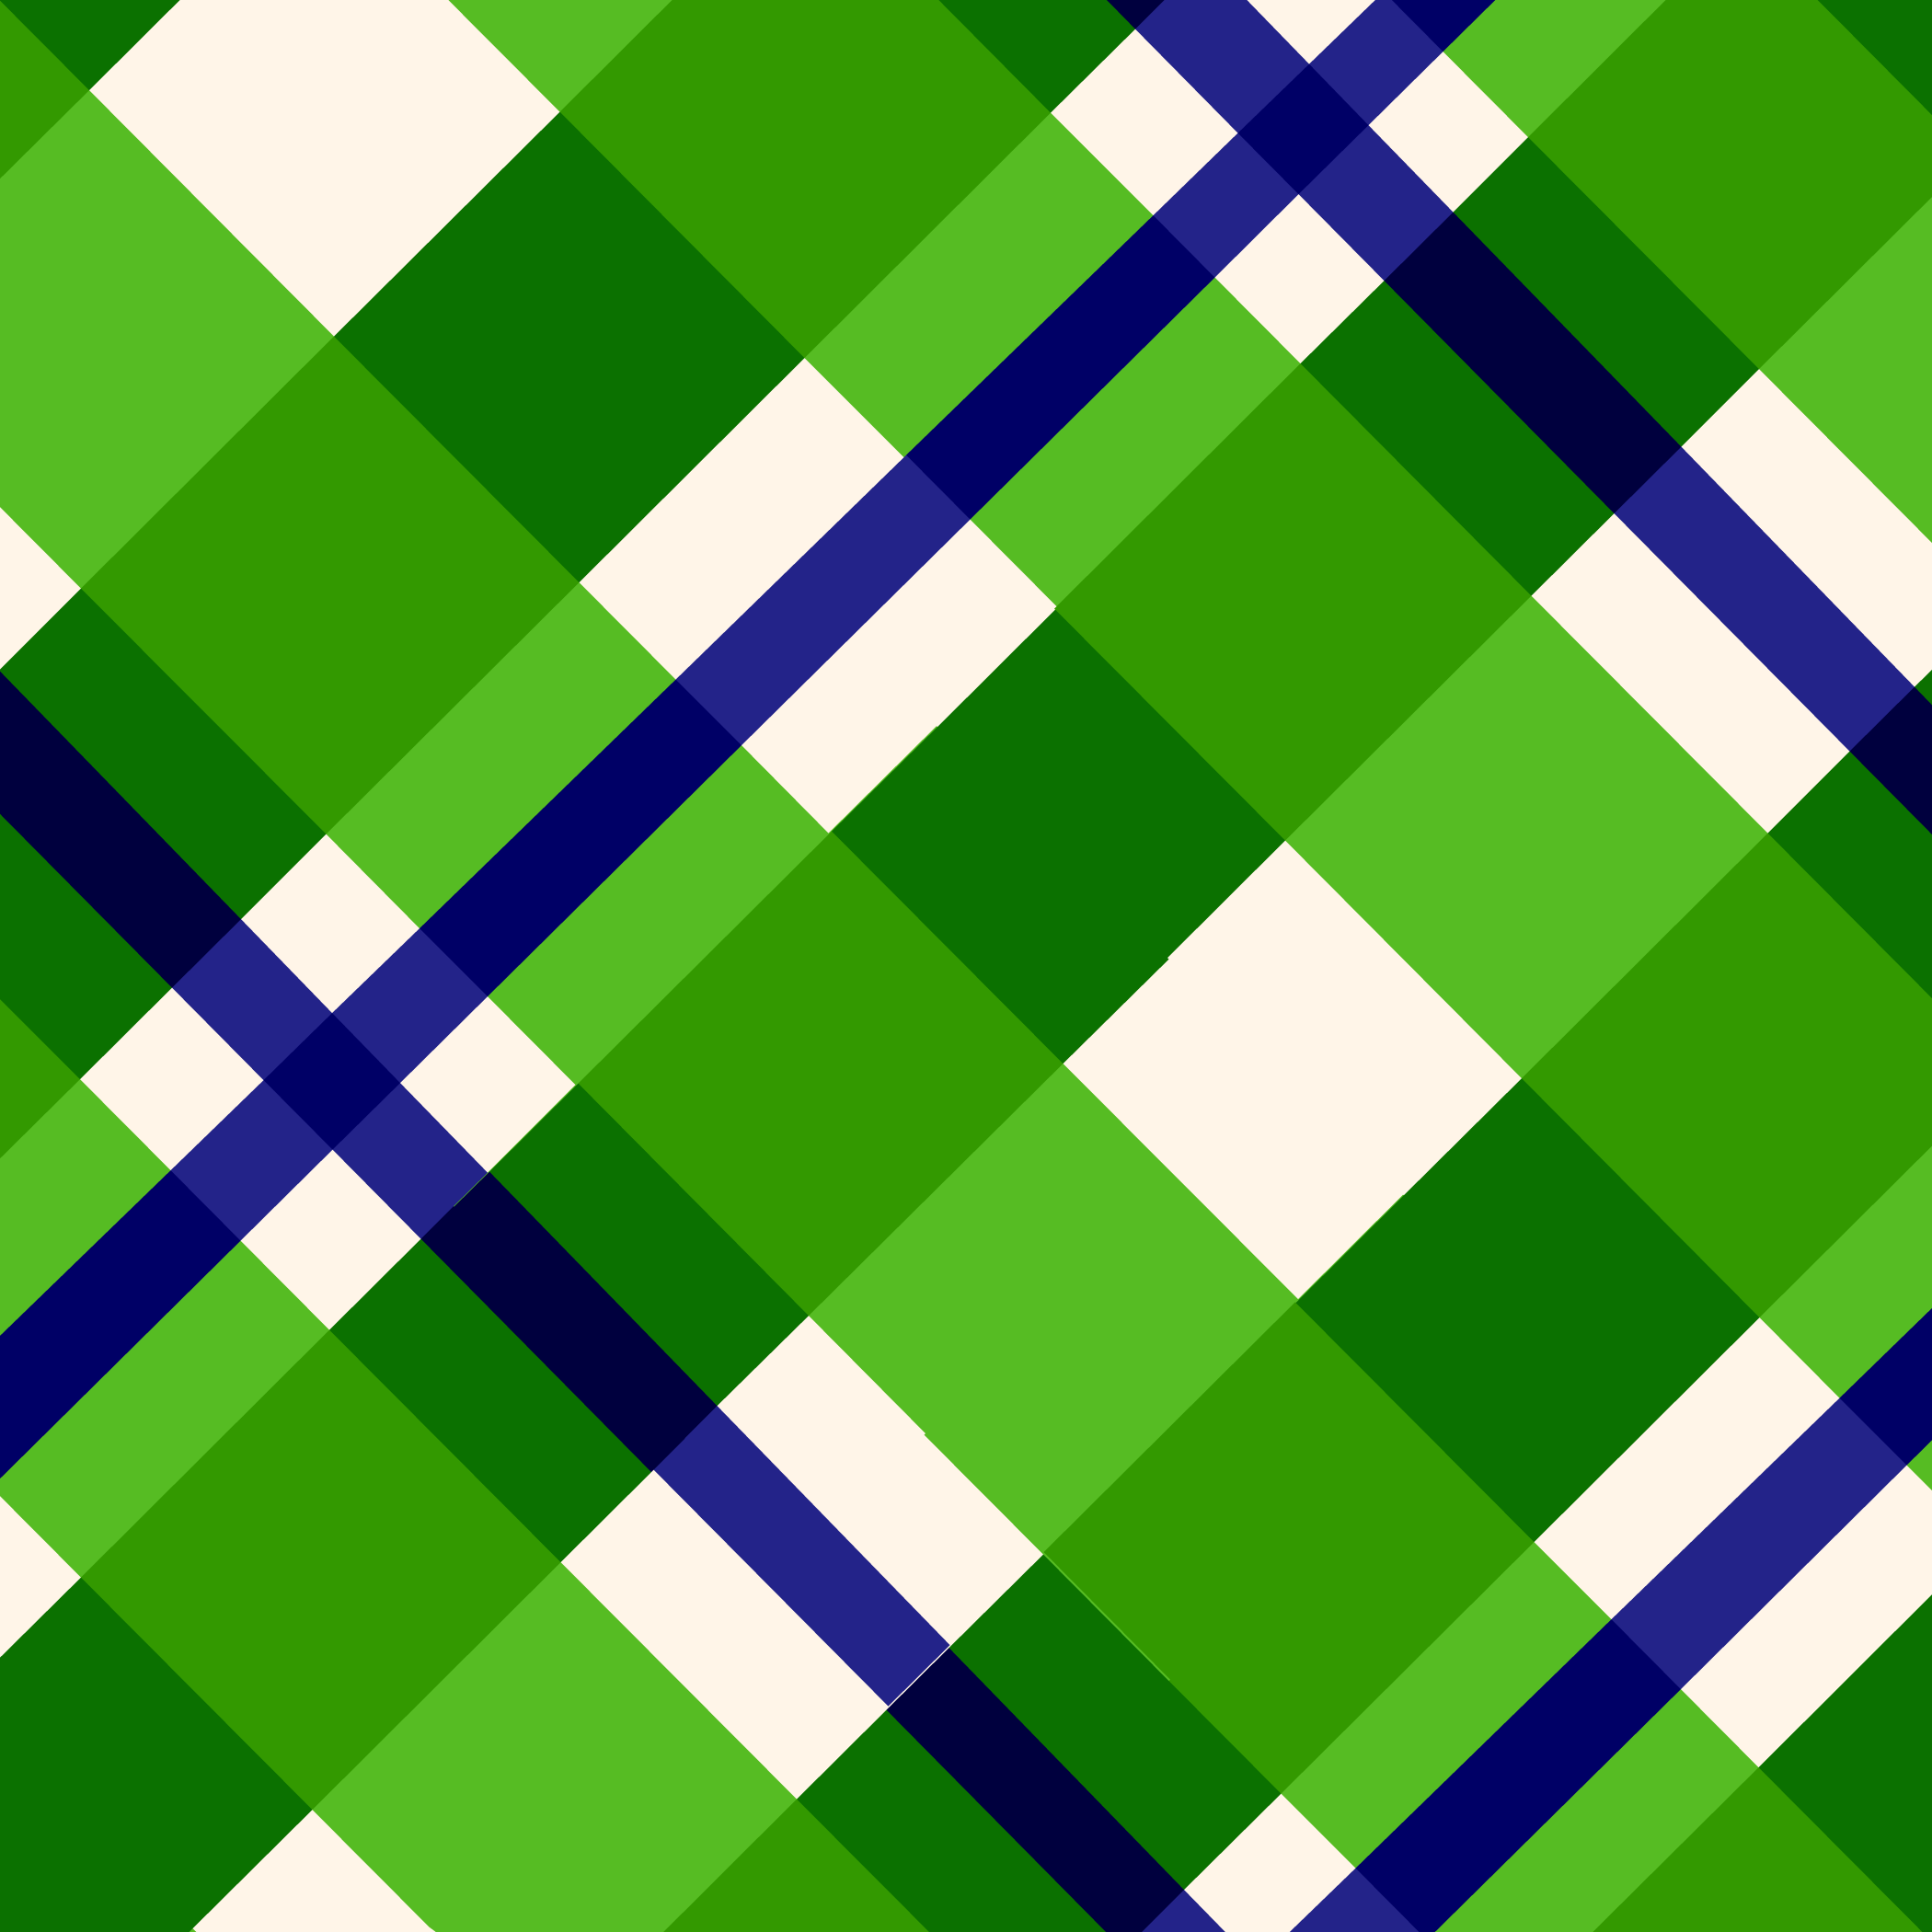 Plaid Background Green Green Plaid Background